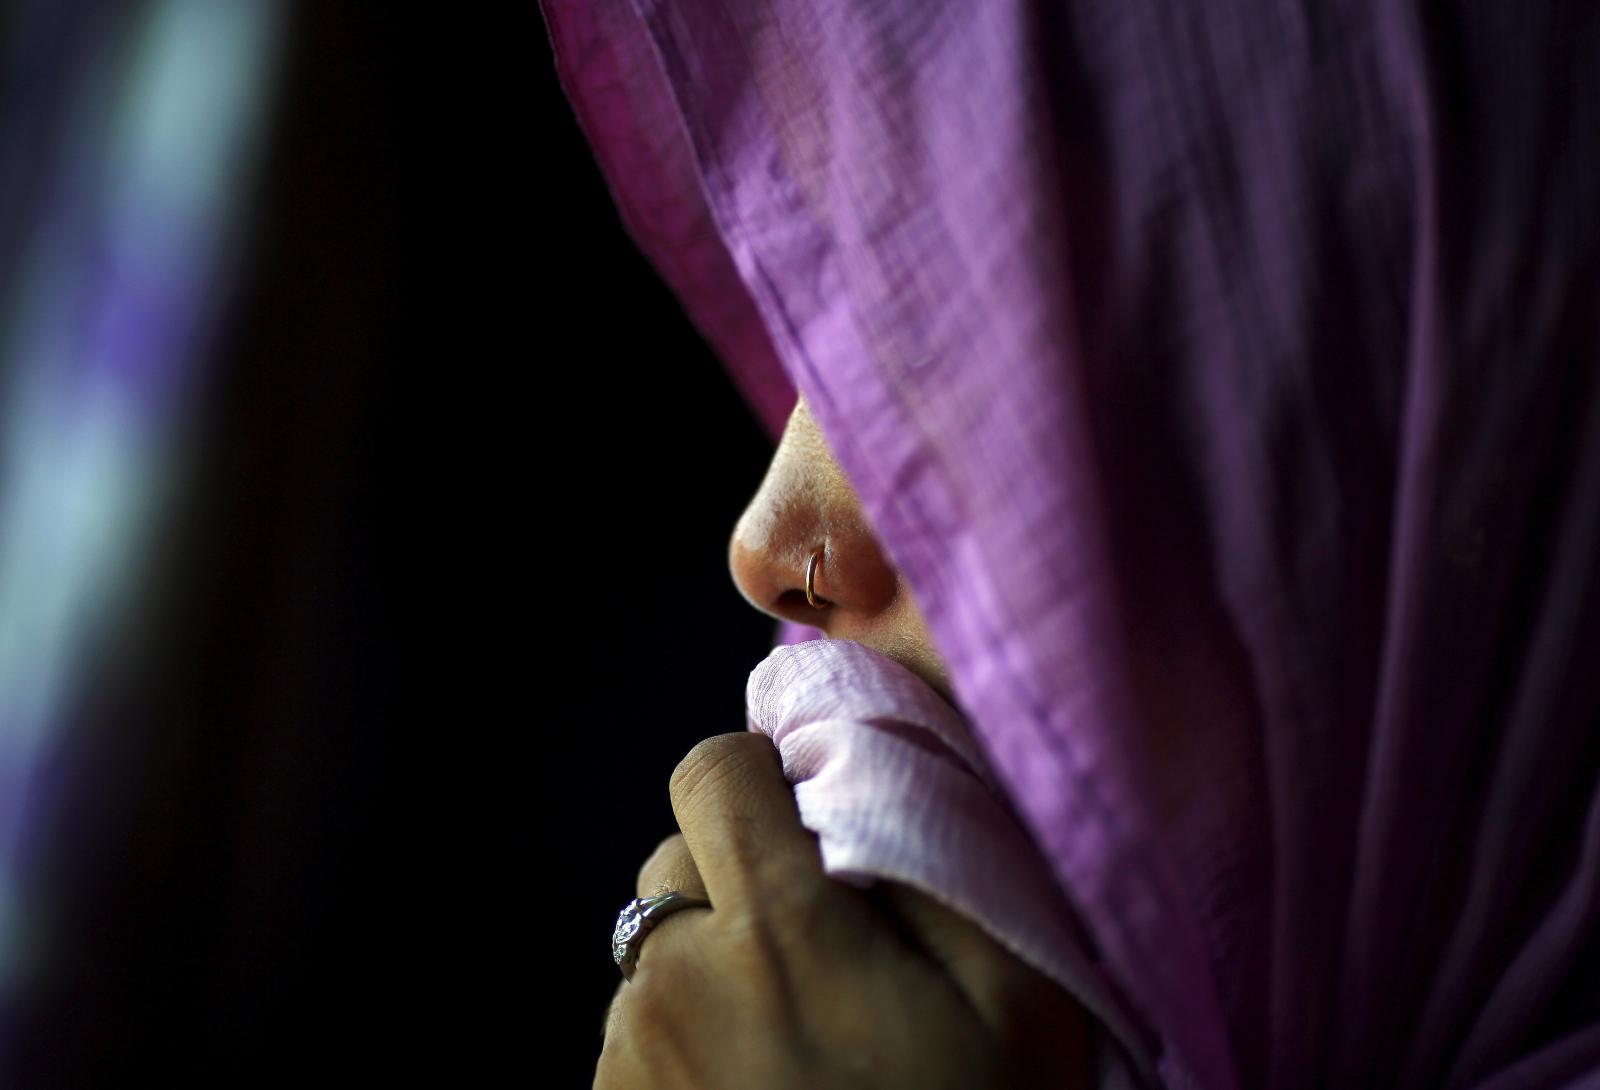 14 men molest two girls in India